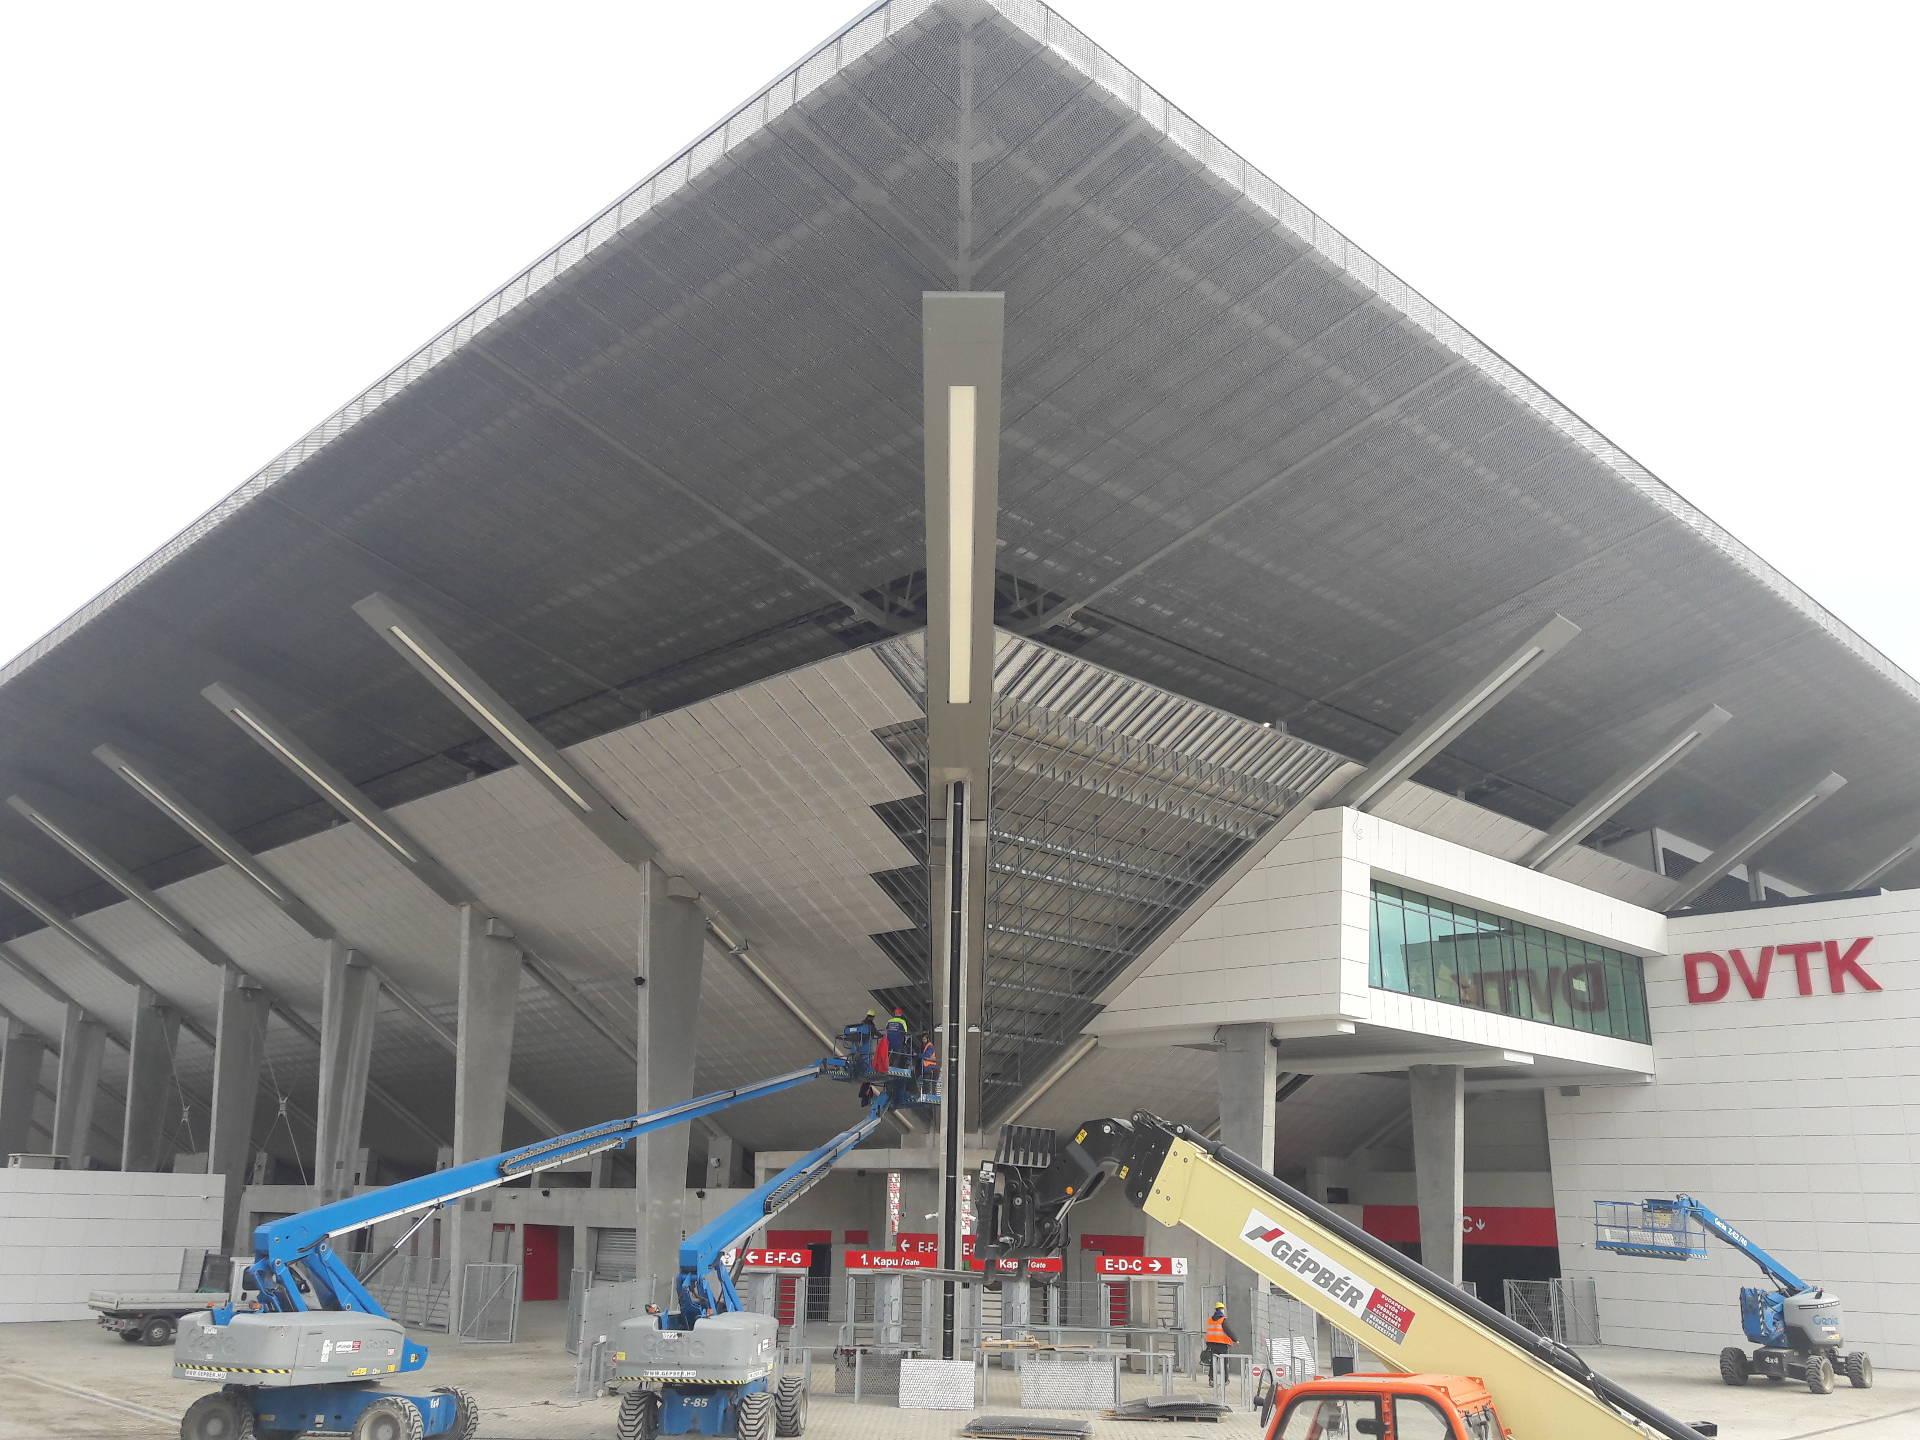 dvtk-stadion-acelepitok-konzol-metal-slider